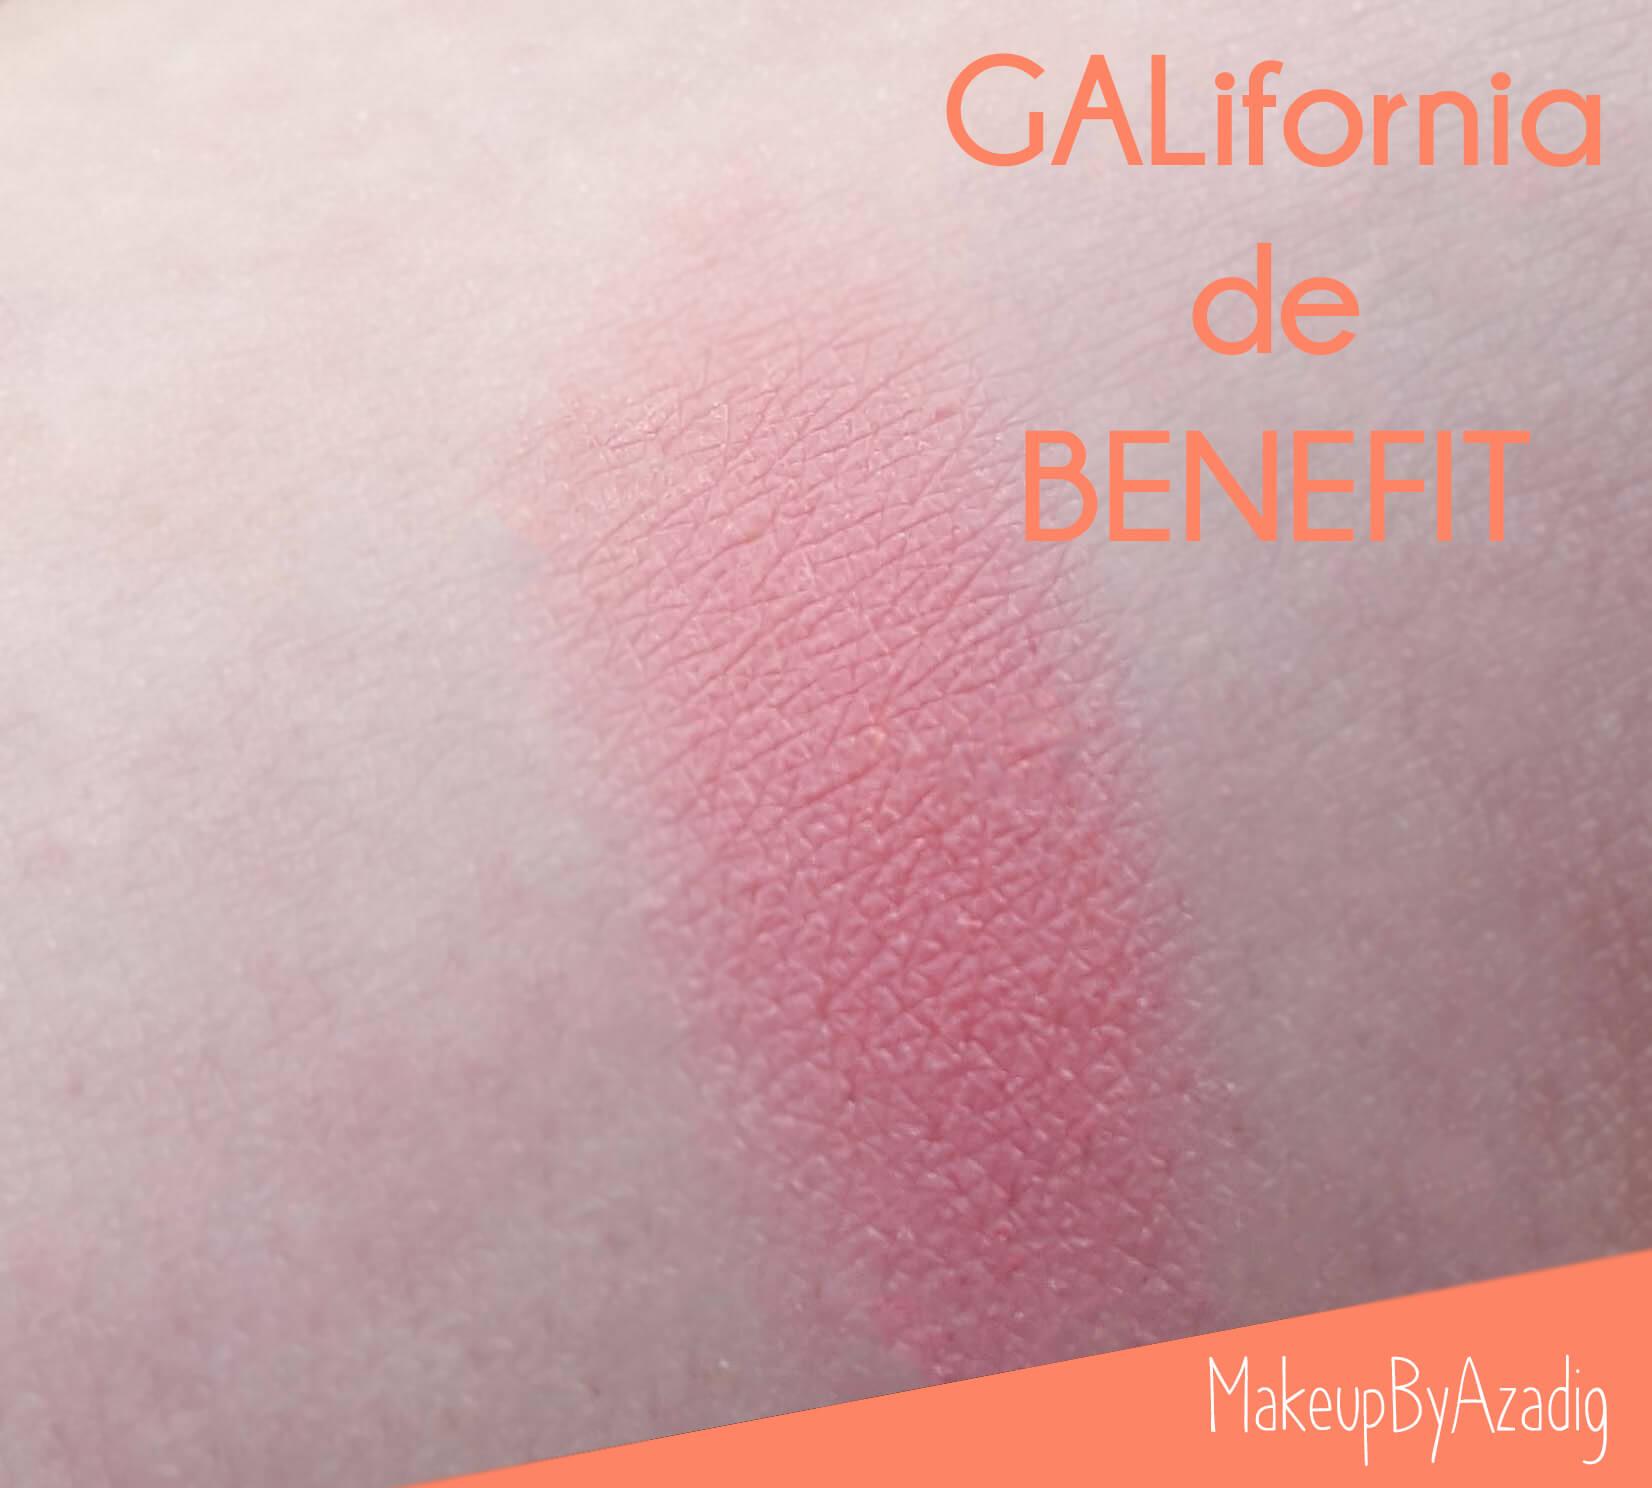 swatch-influencer-revue-review-blush-benefit-galifornia-san-francisco-sunny-golden-pink-blush-avis-prix-sephora-makeupbyazadig-coachella